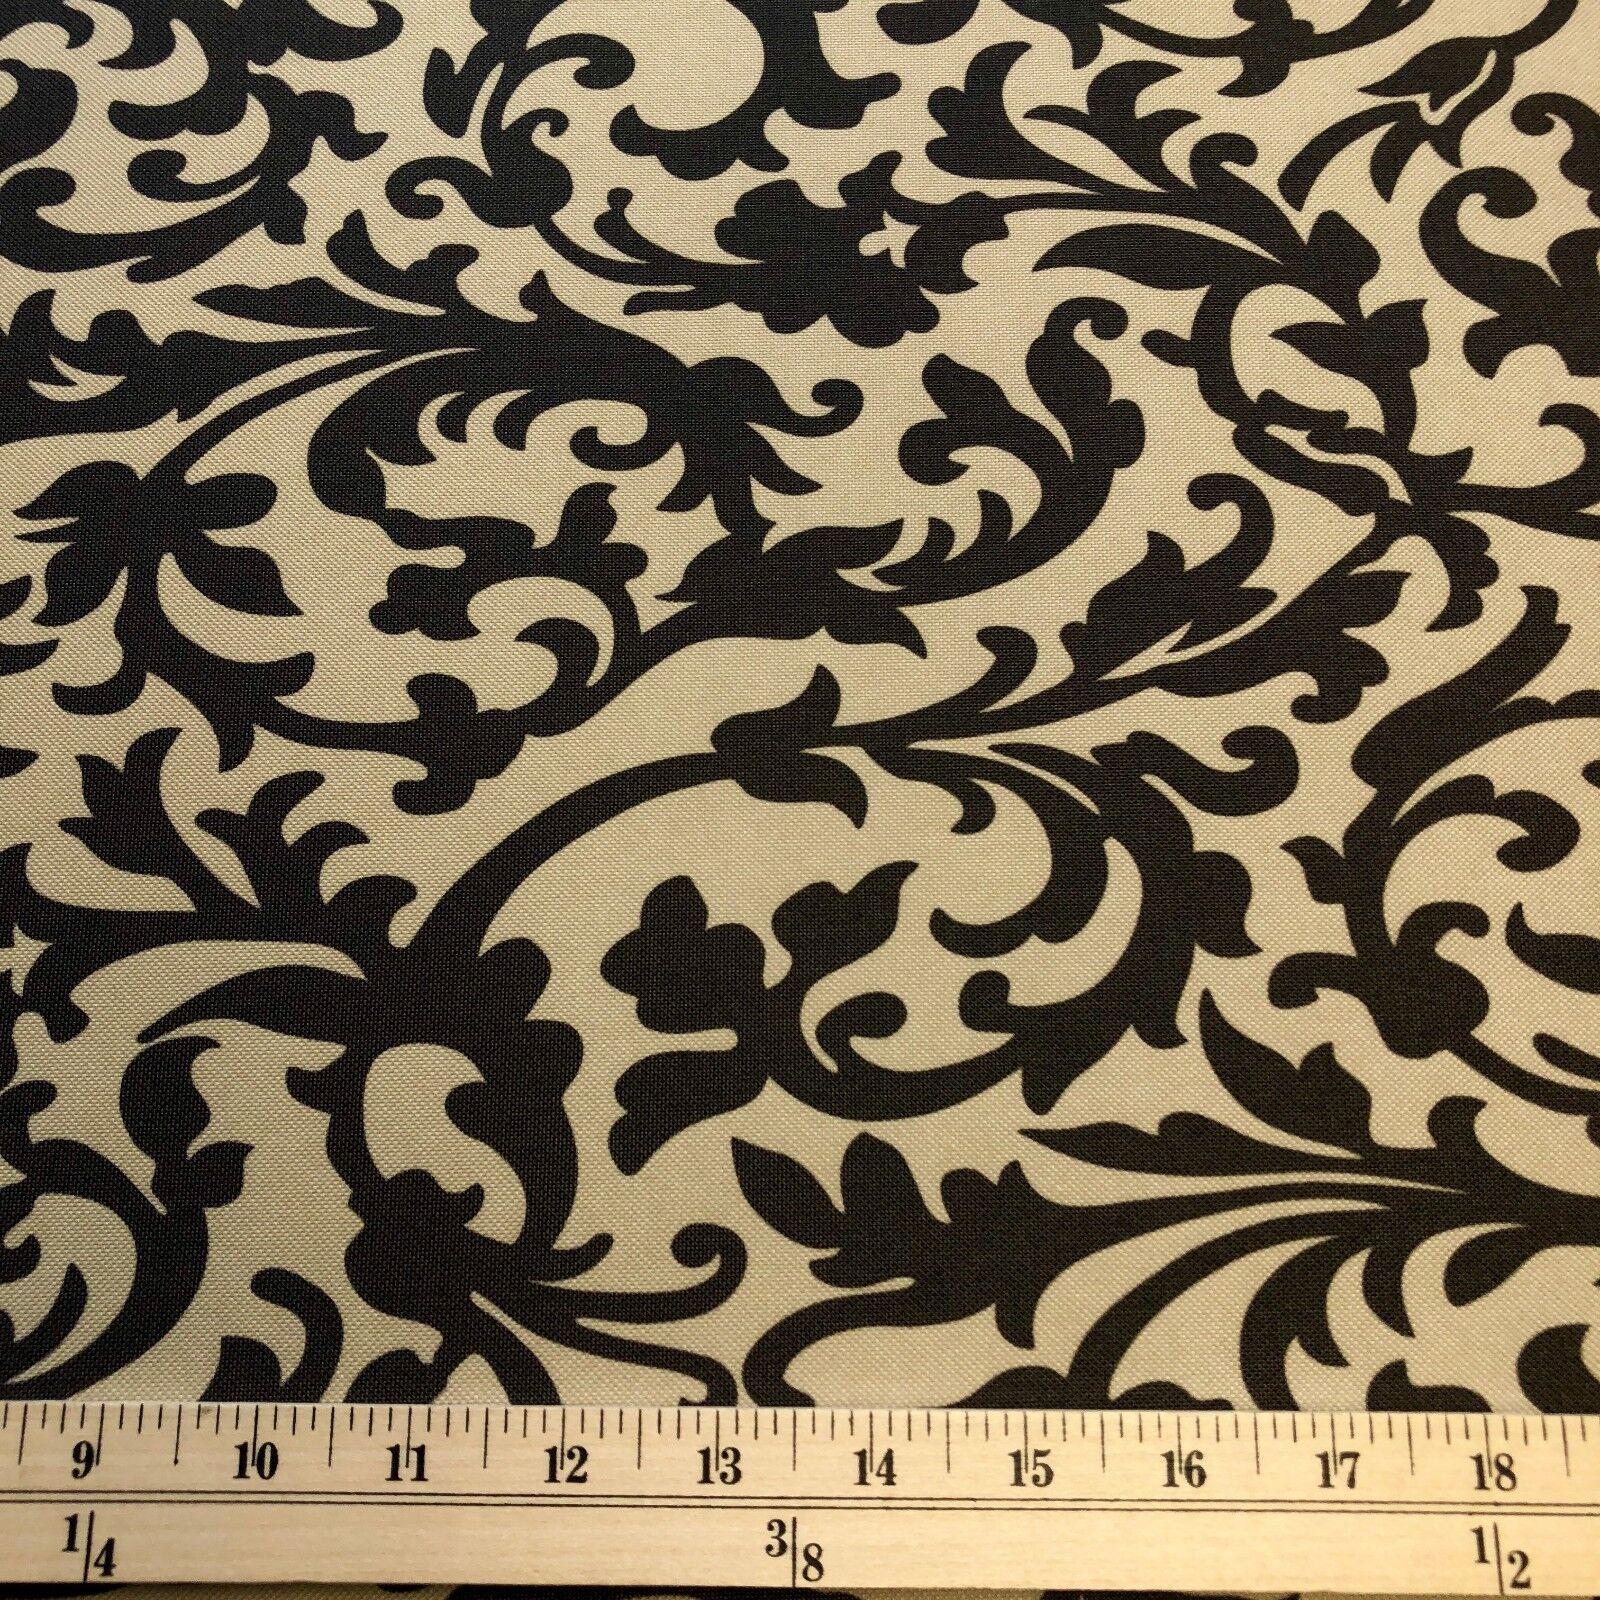 canvas fabric waterproof - HD1600×1600